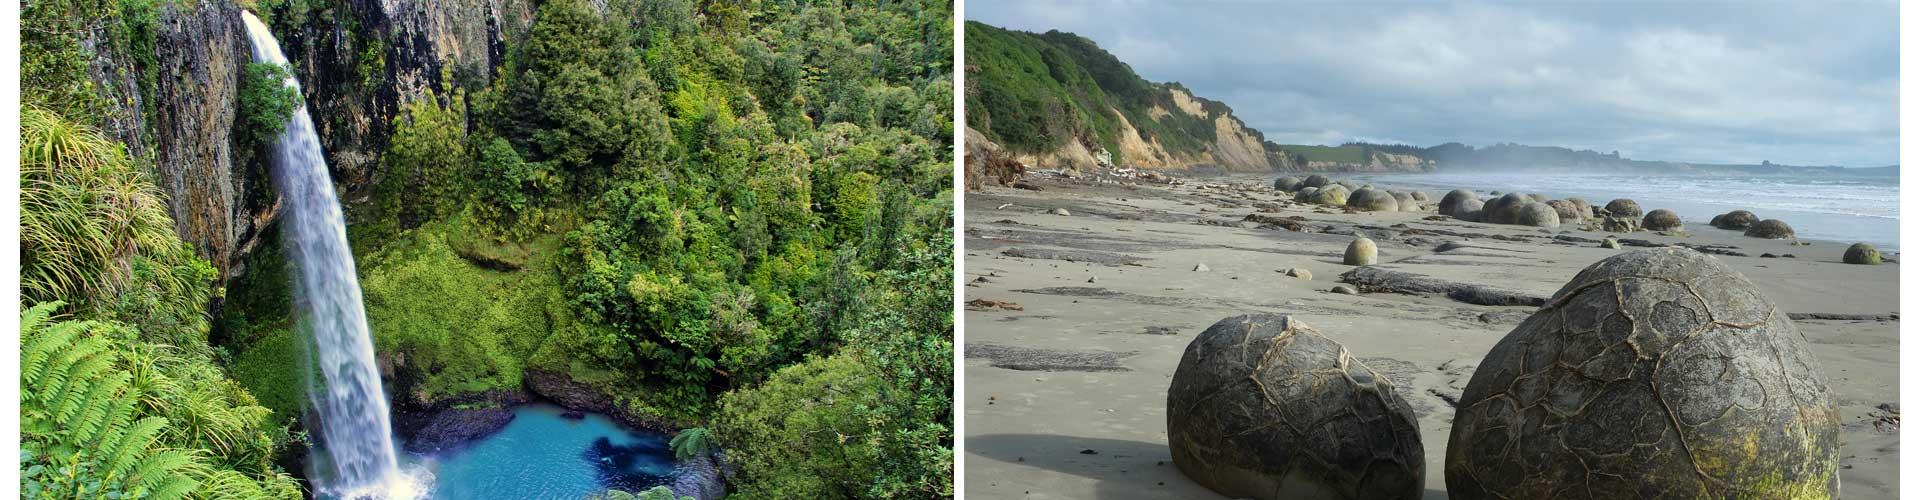 Neuseeland Reisetagebuch Ozeanien Wasserfall Boulders Bridal Veil